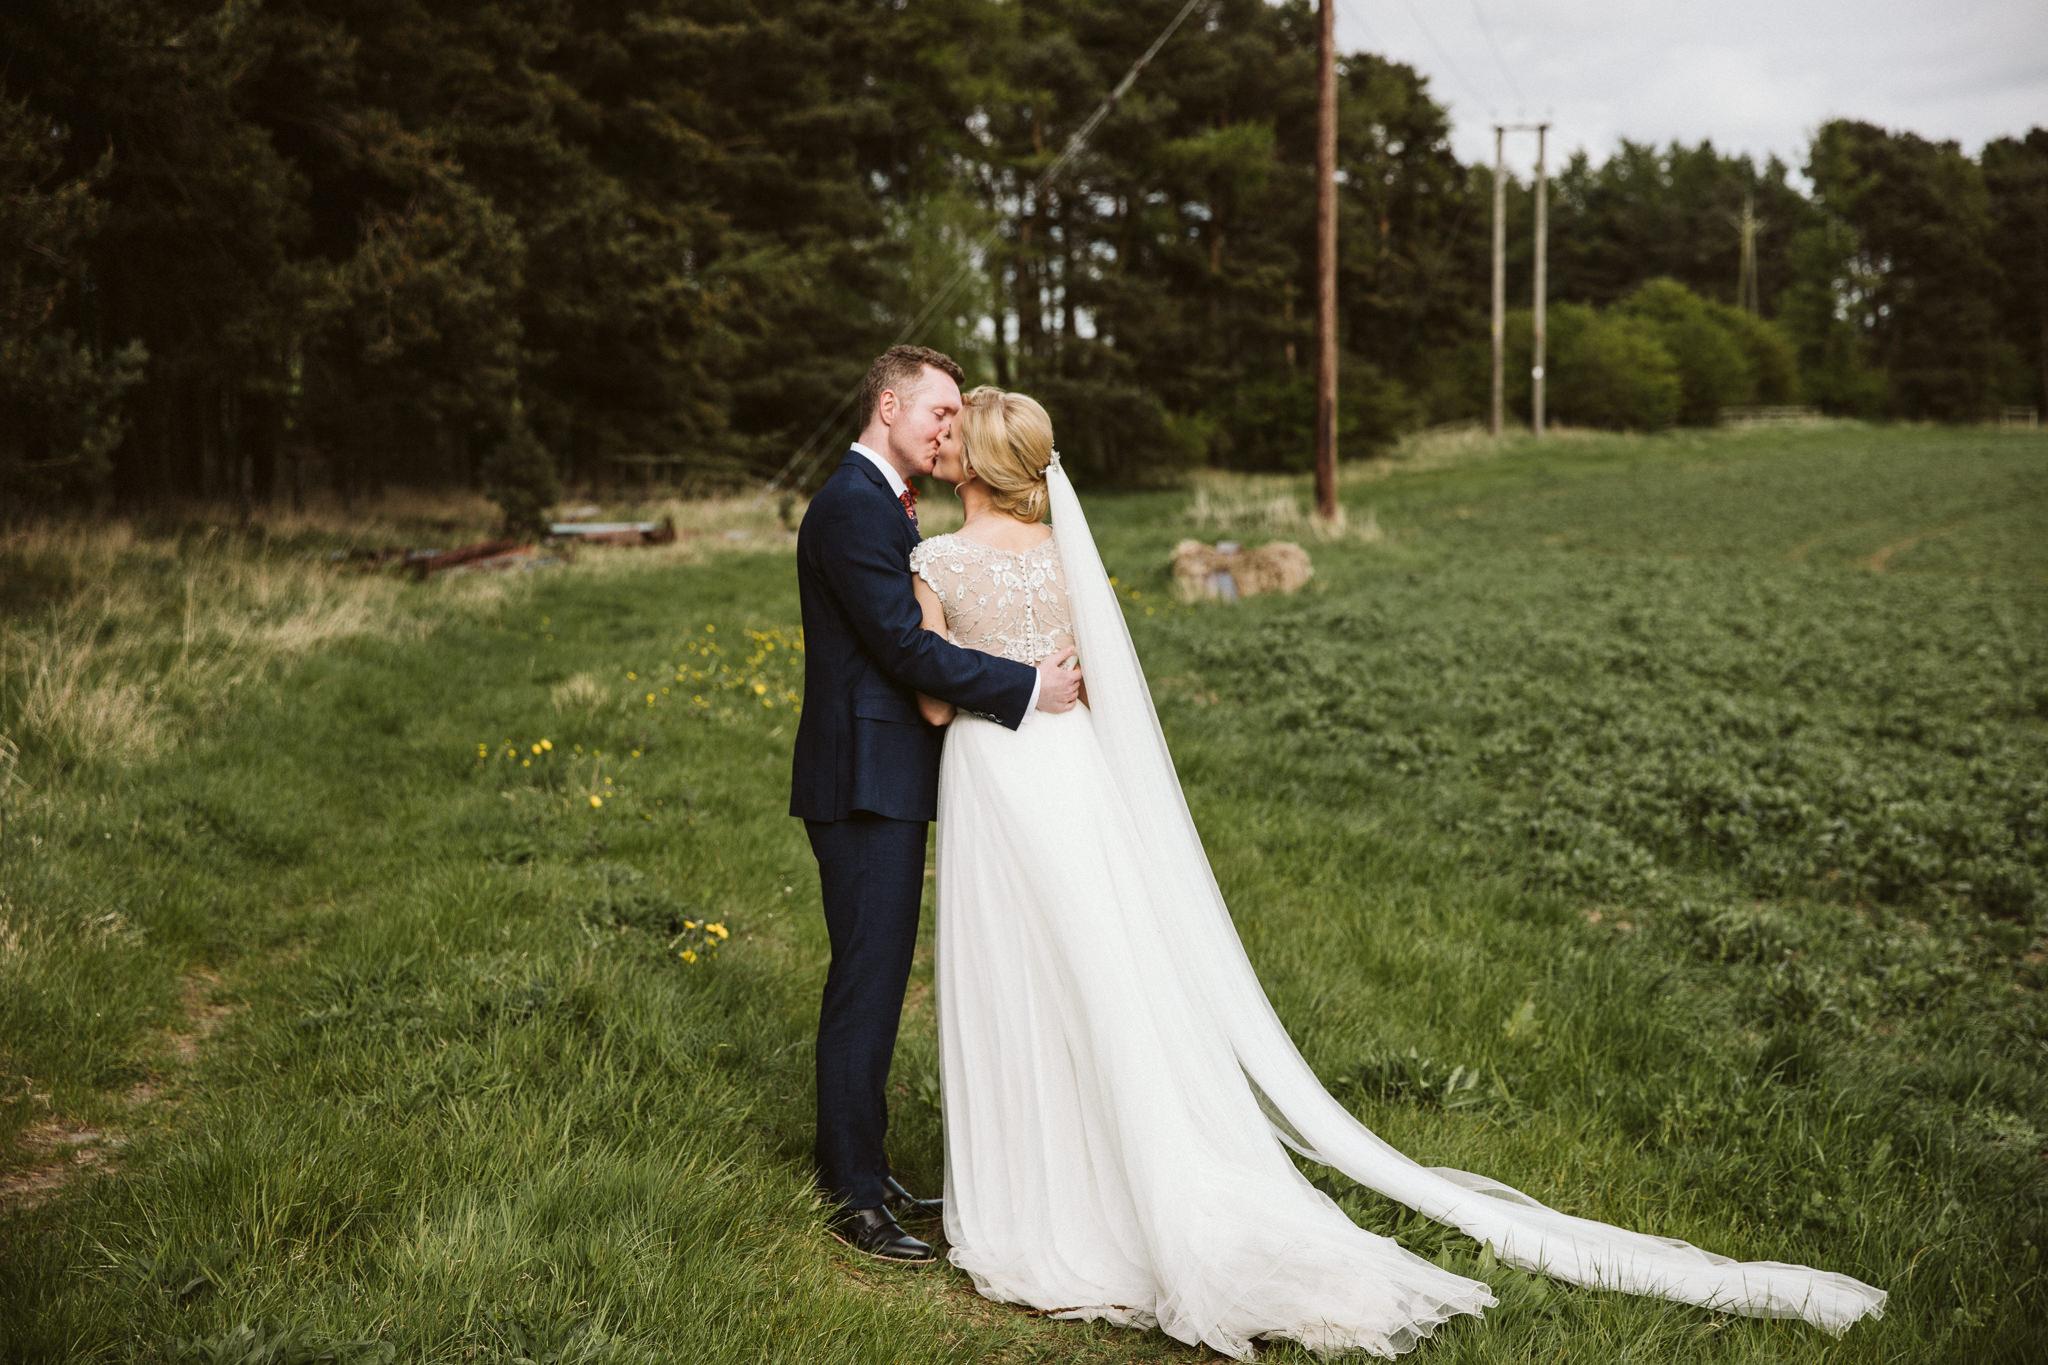 northside-farm-wedding-northumberland-margarita-hope (76).jpg